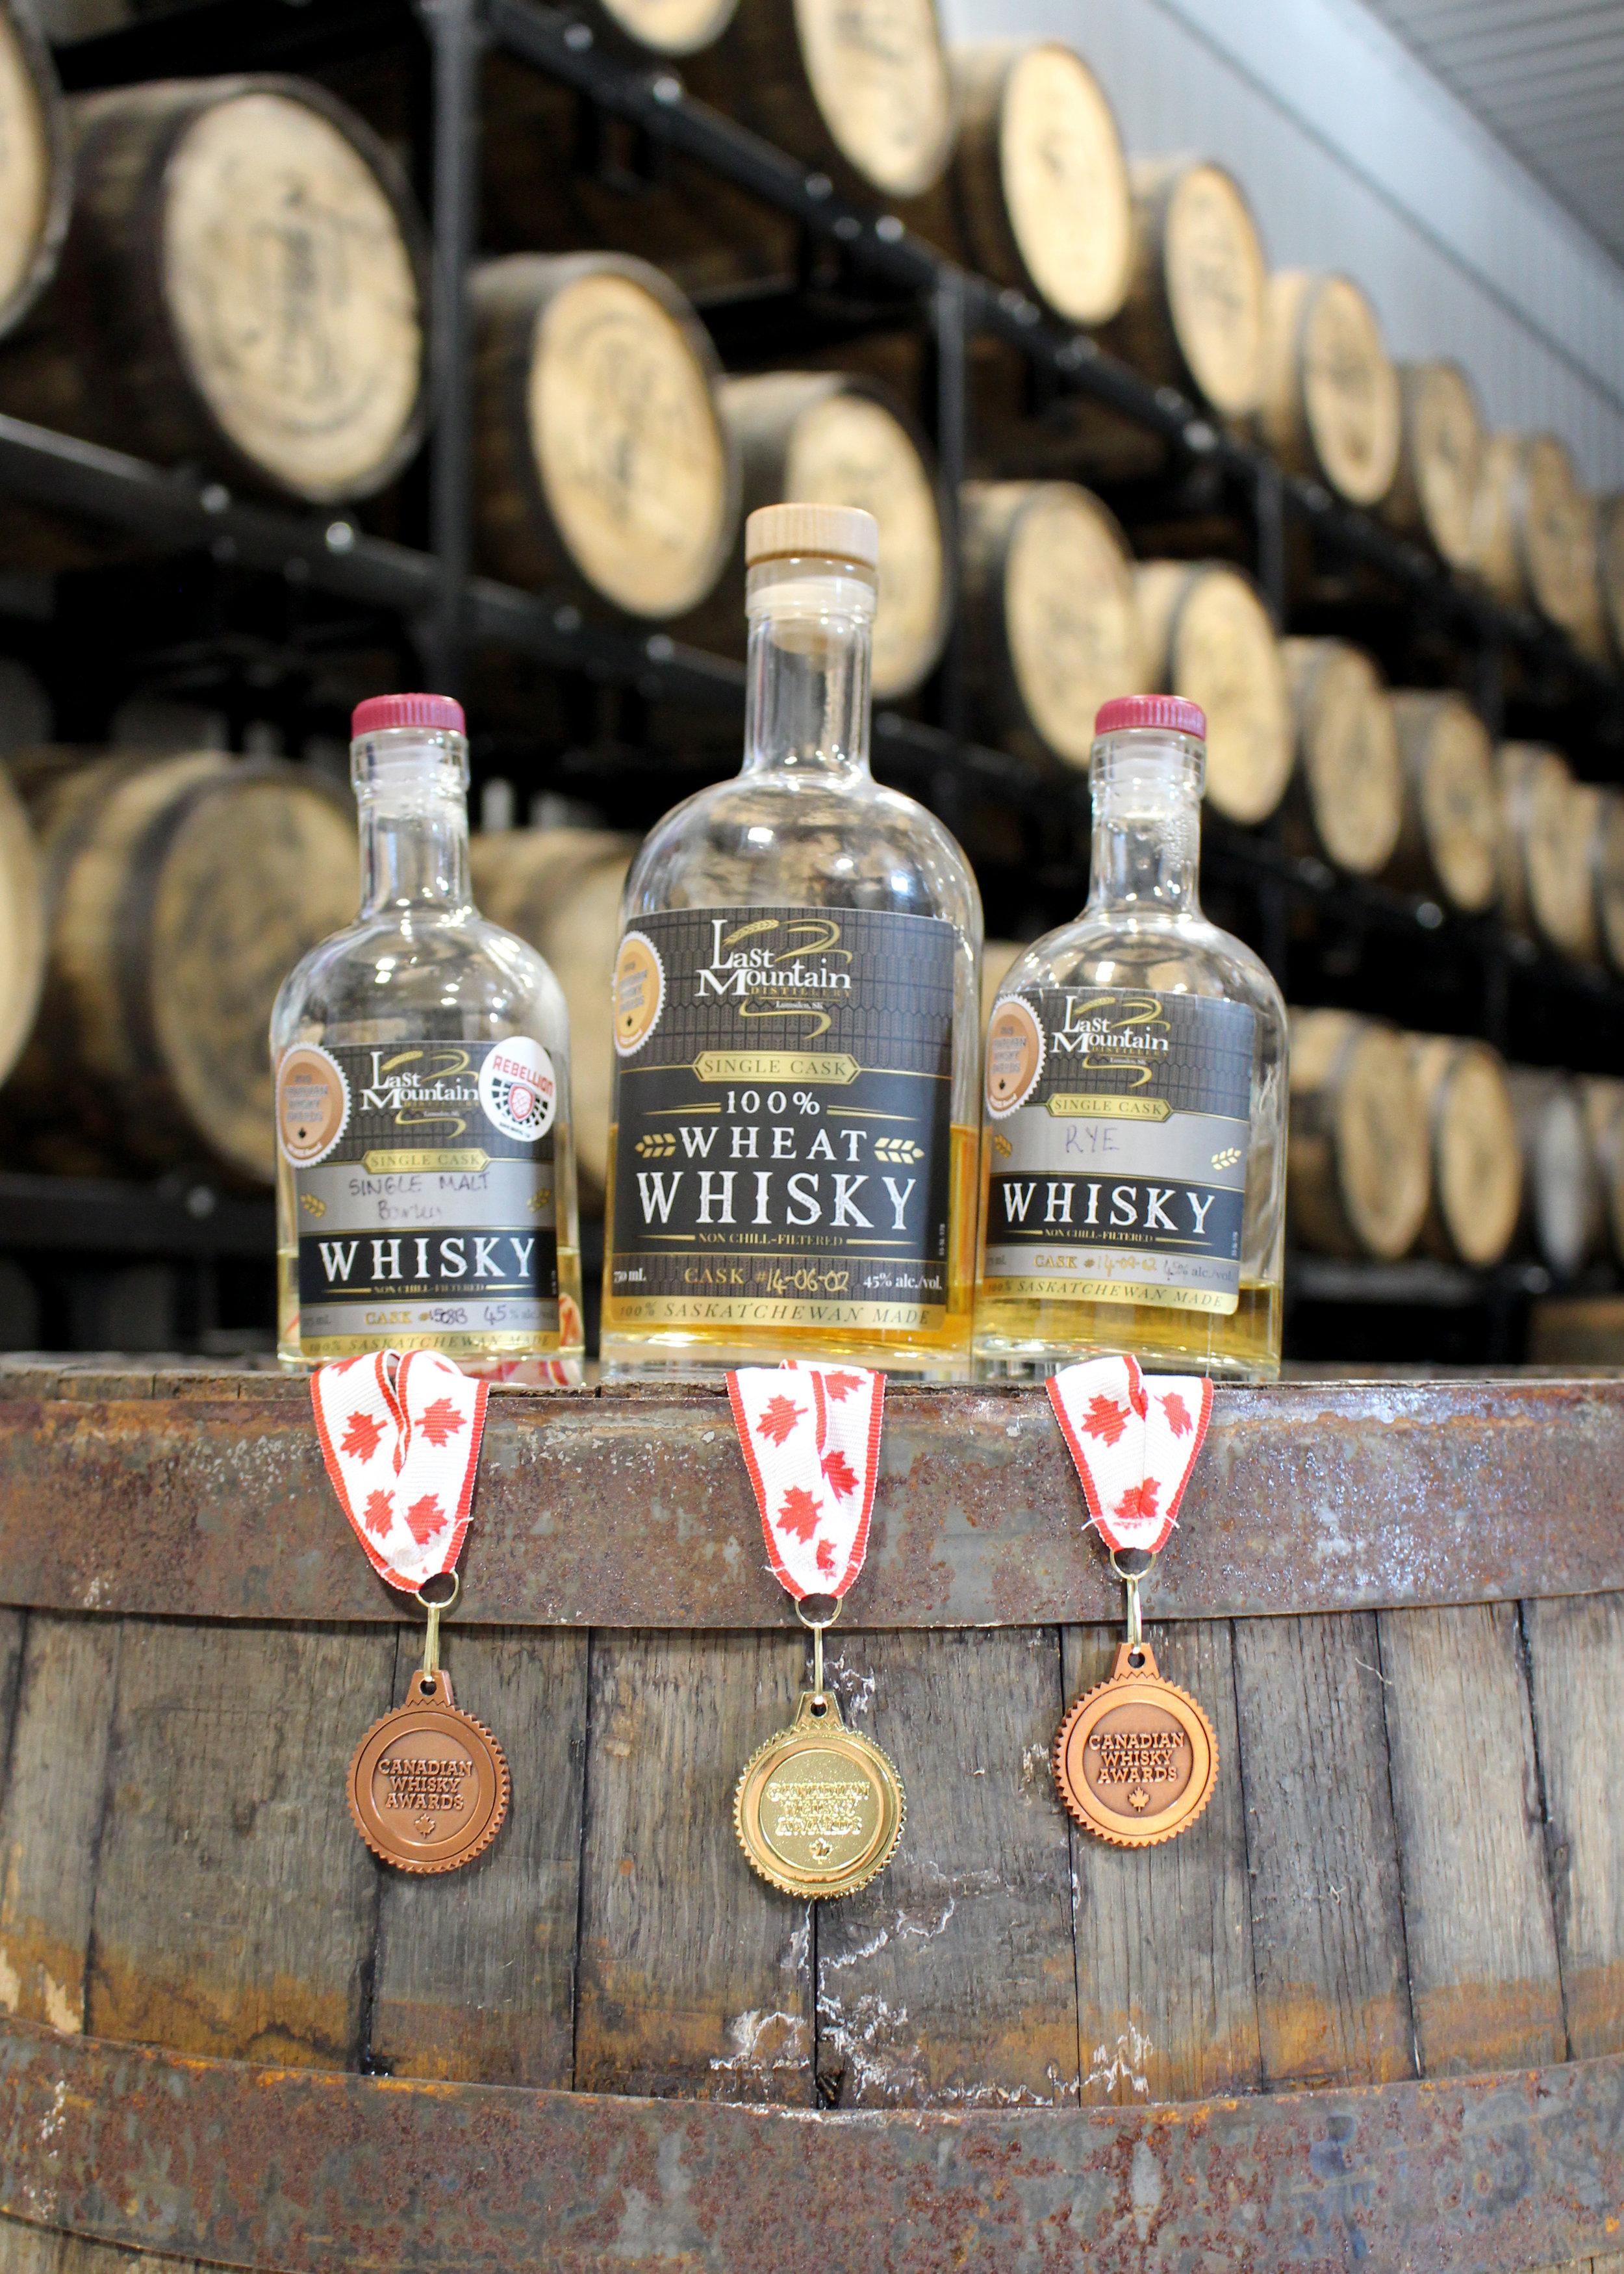 2018 Canadian Whisky Awards.